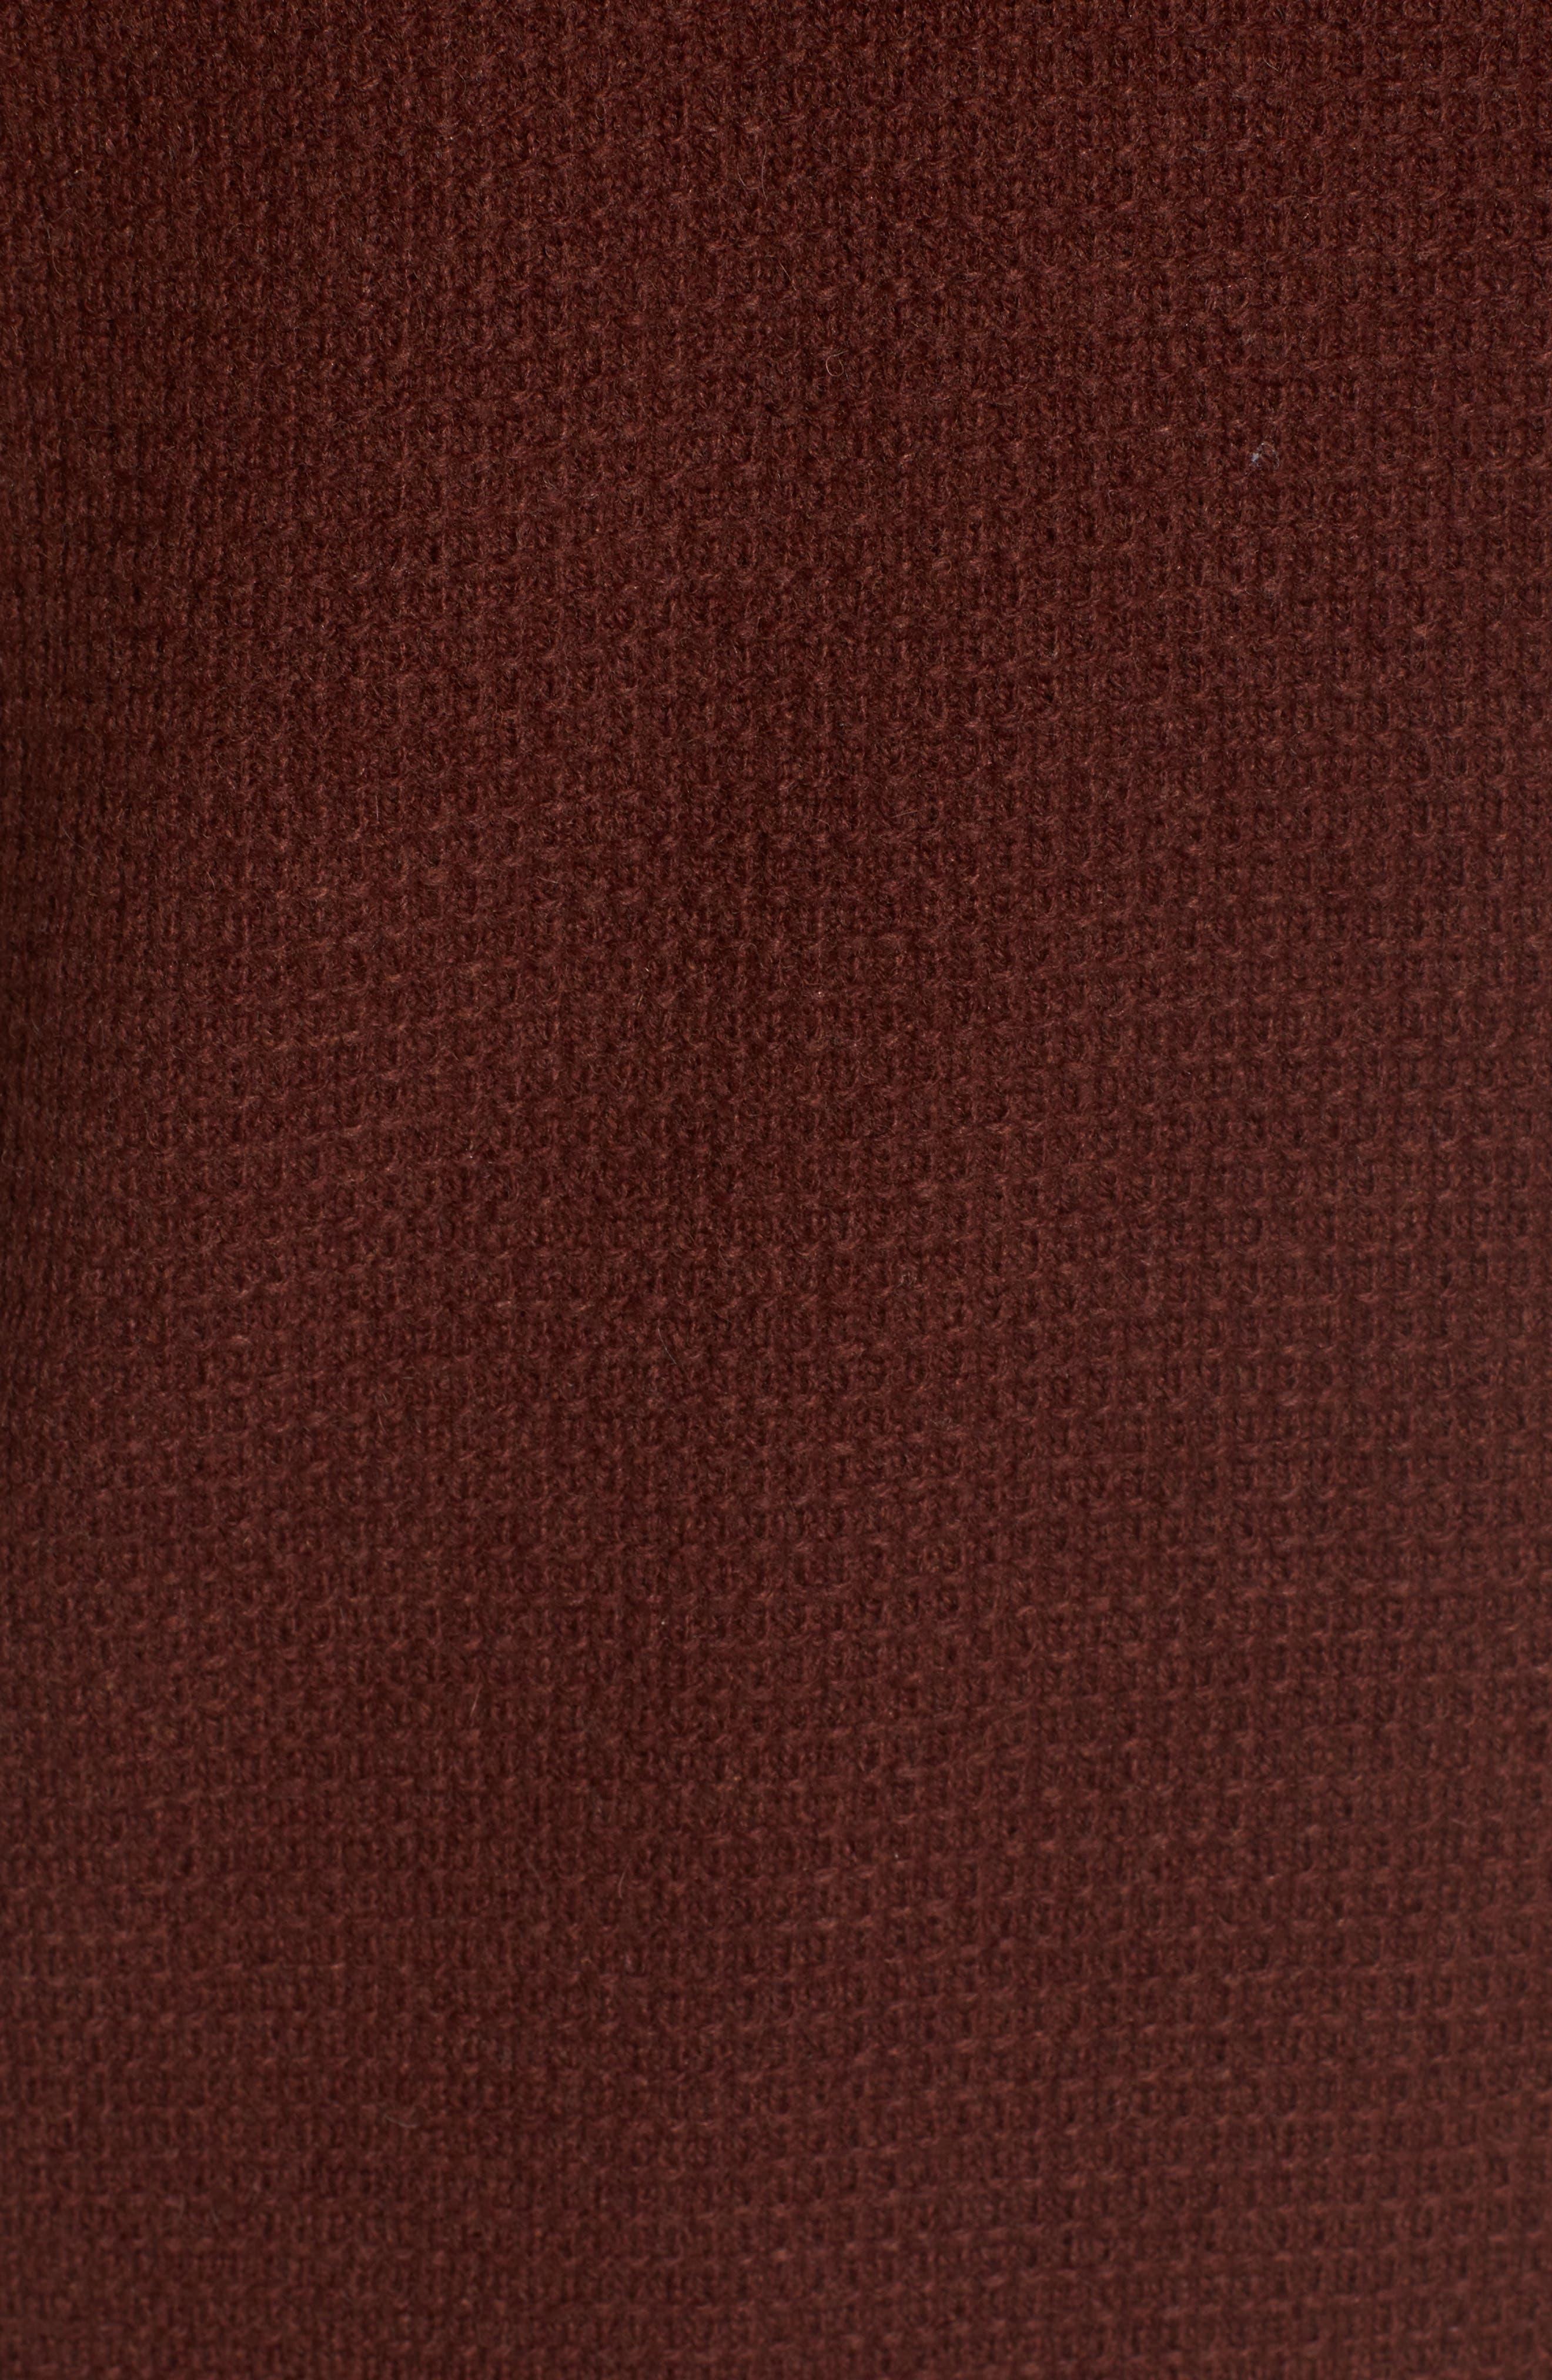 Thermal Henley,                             Alternate thumbnail 5, color,                             Burgundy